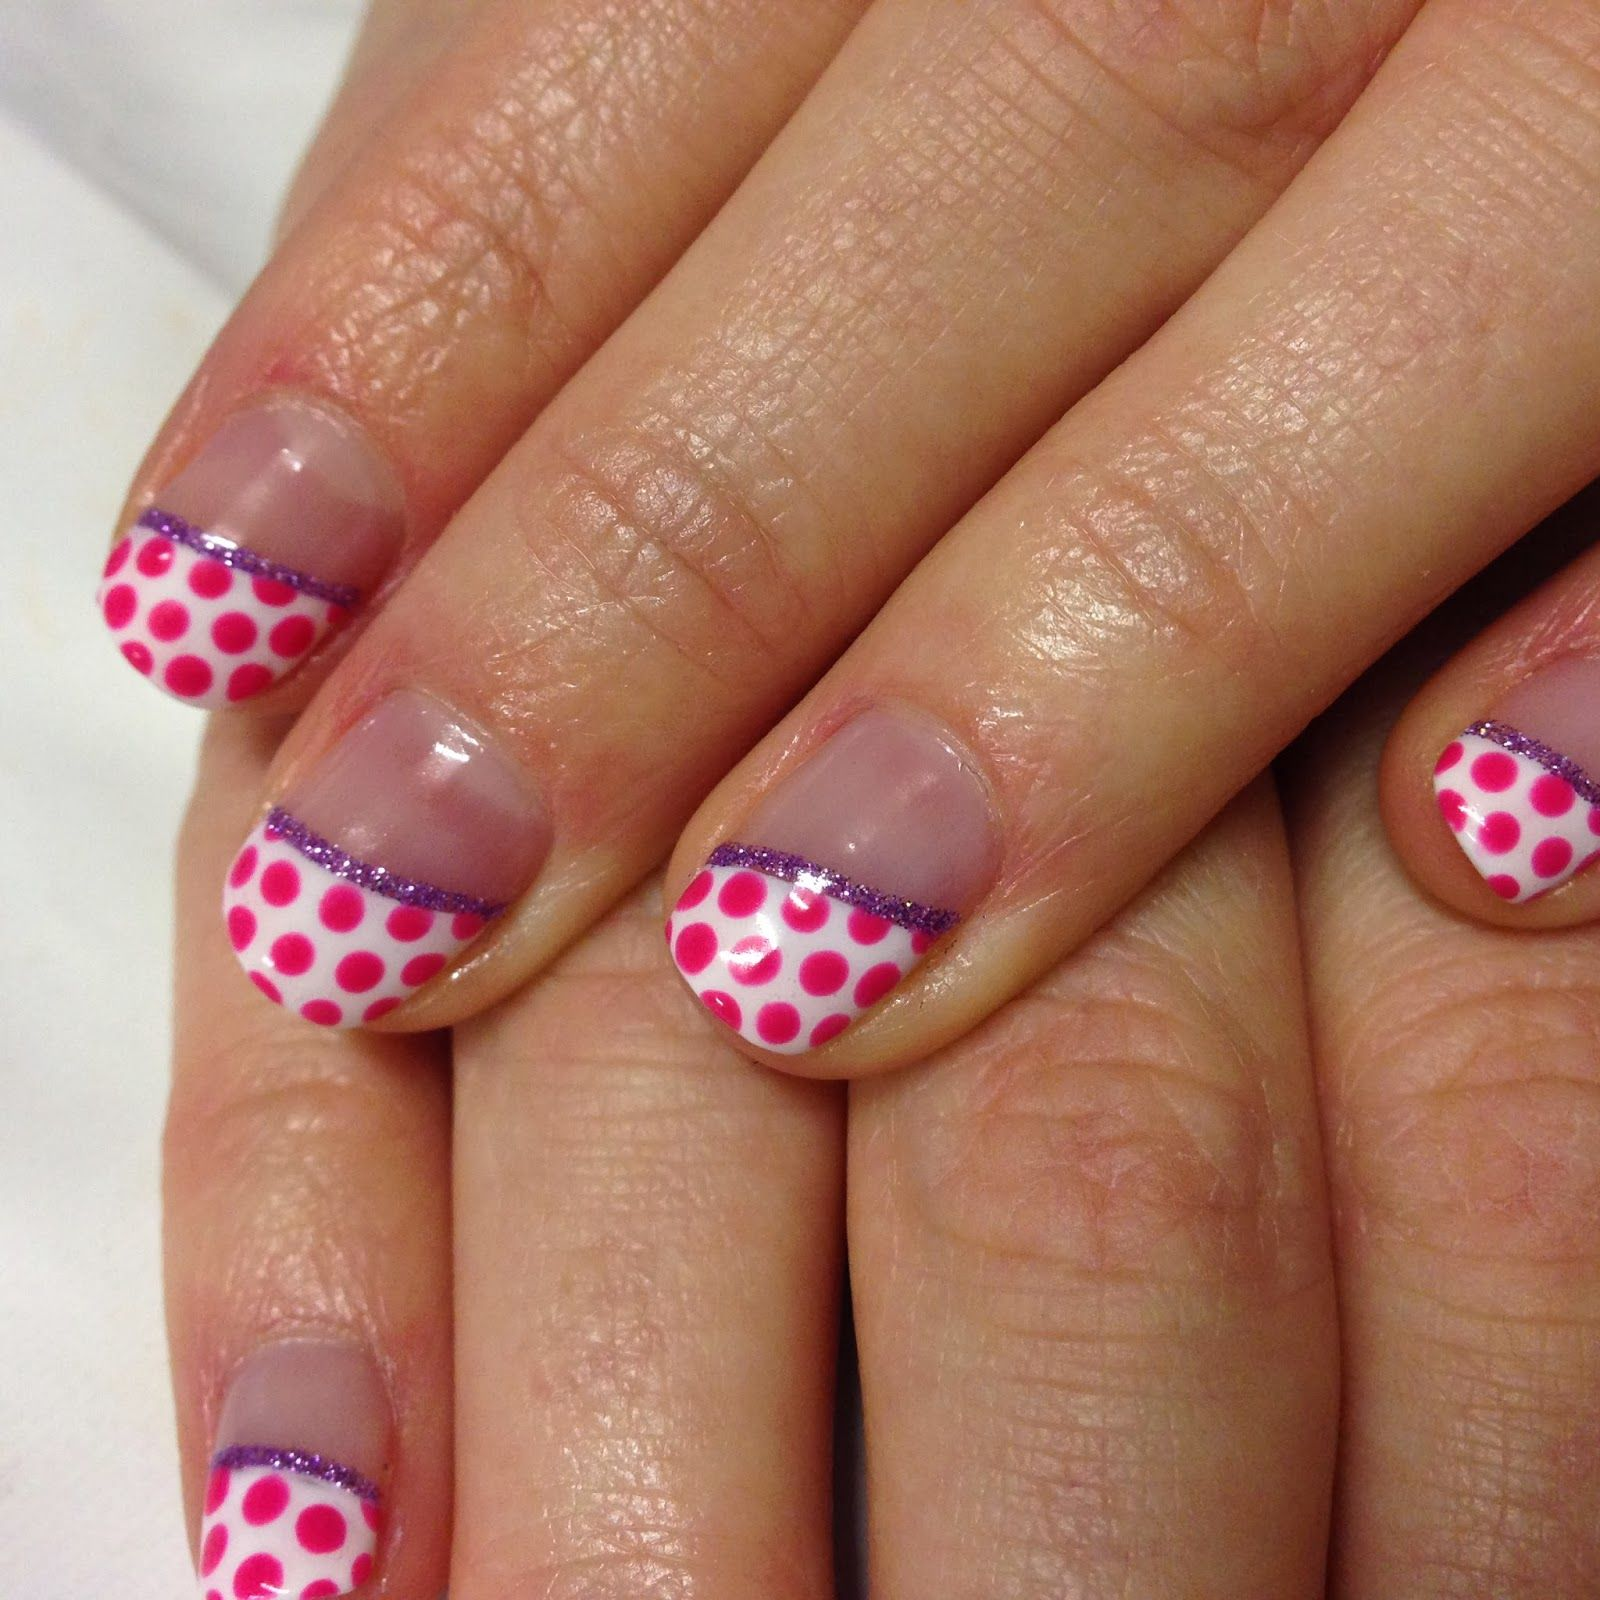 Brush up and polish up cnd shellac nail art diagonal french brush up and polish up cnd shellac nail art diagonal french and polka prinsesfo Image collections